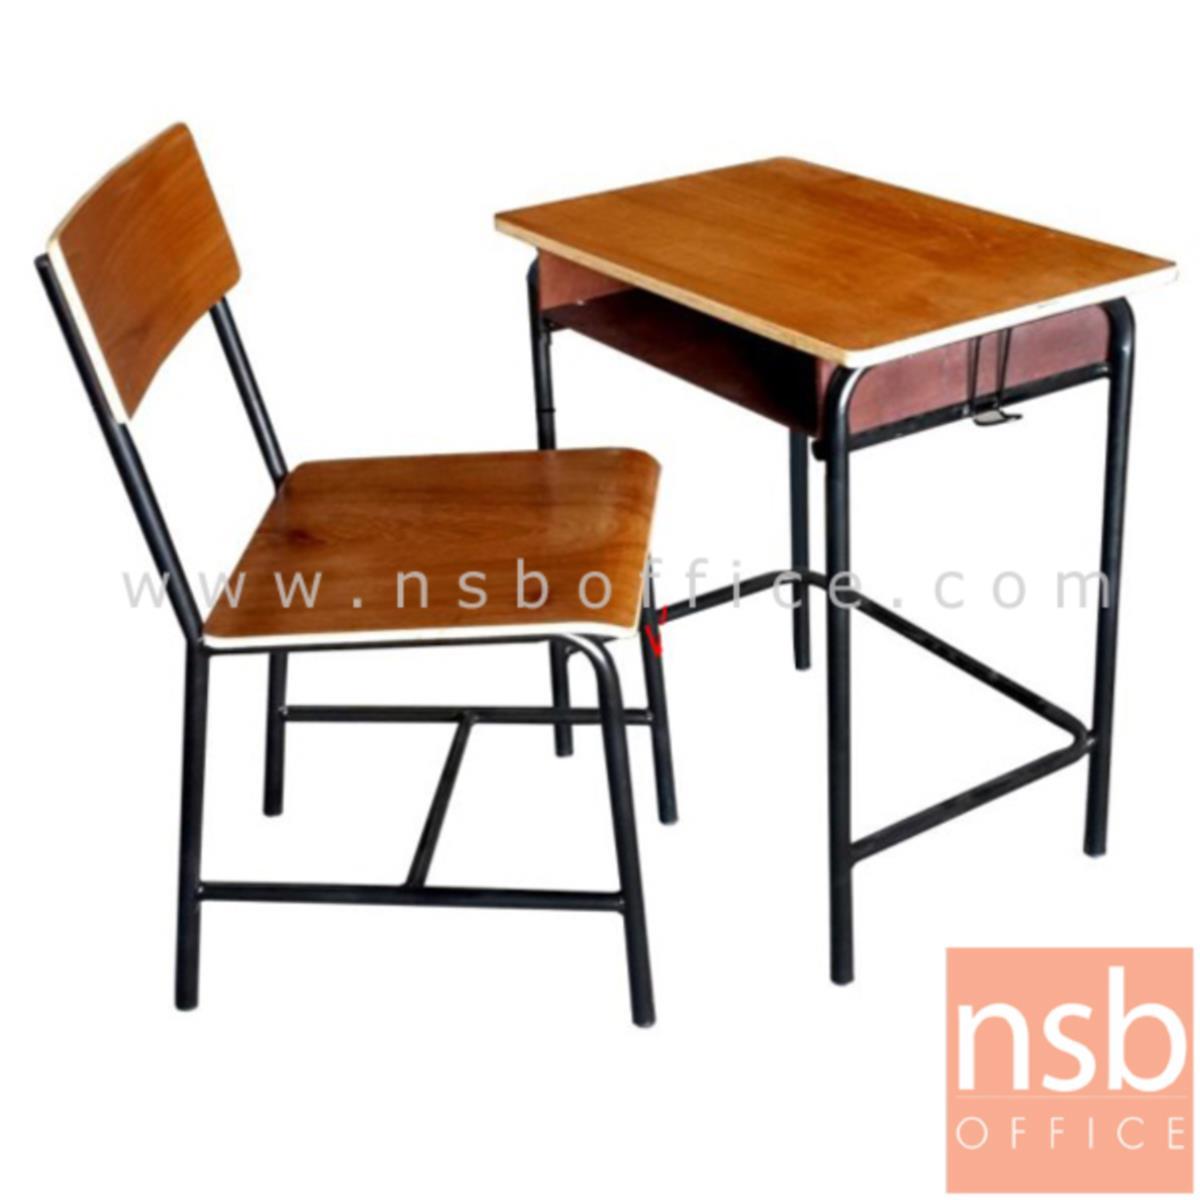 A17A030:ชุดโต๊ะและเก้าอี้นักเรียน รุ่น Ansonia (เอนโซเนีย)  ระดับประถม ขาเหล็กกลมพ่นดำ